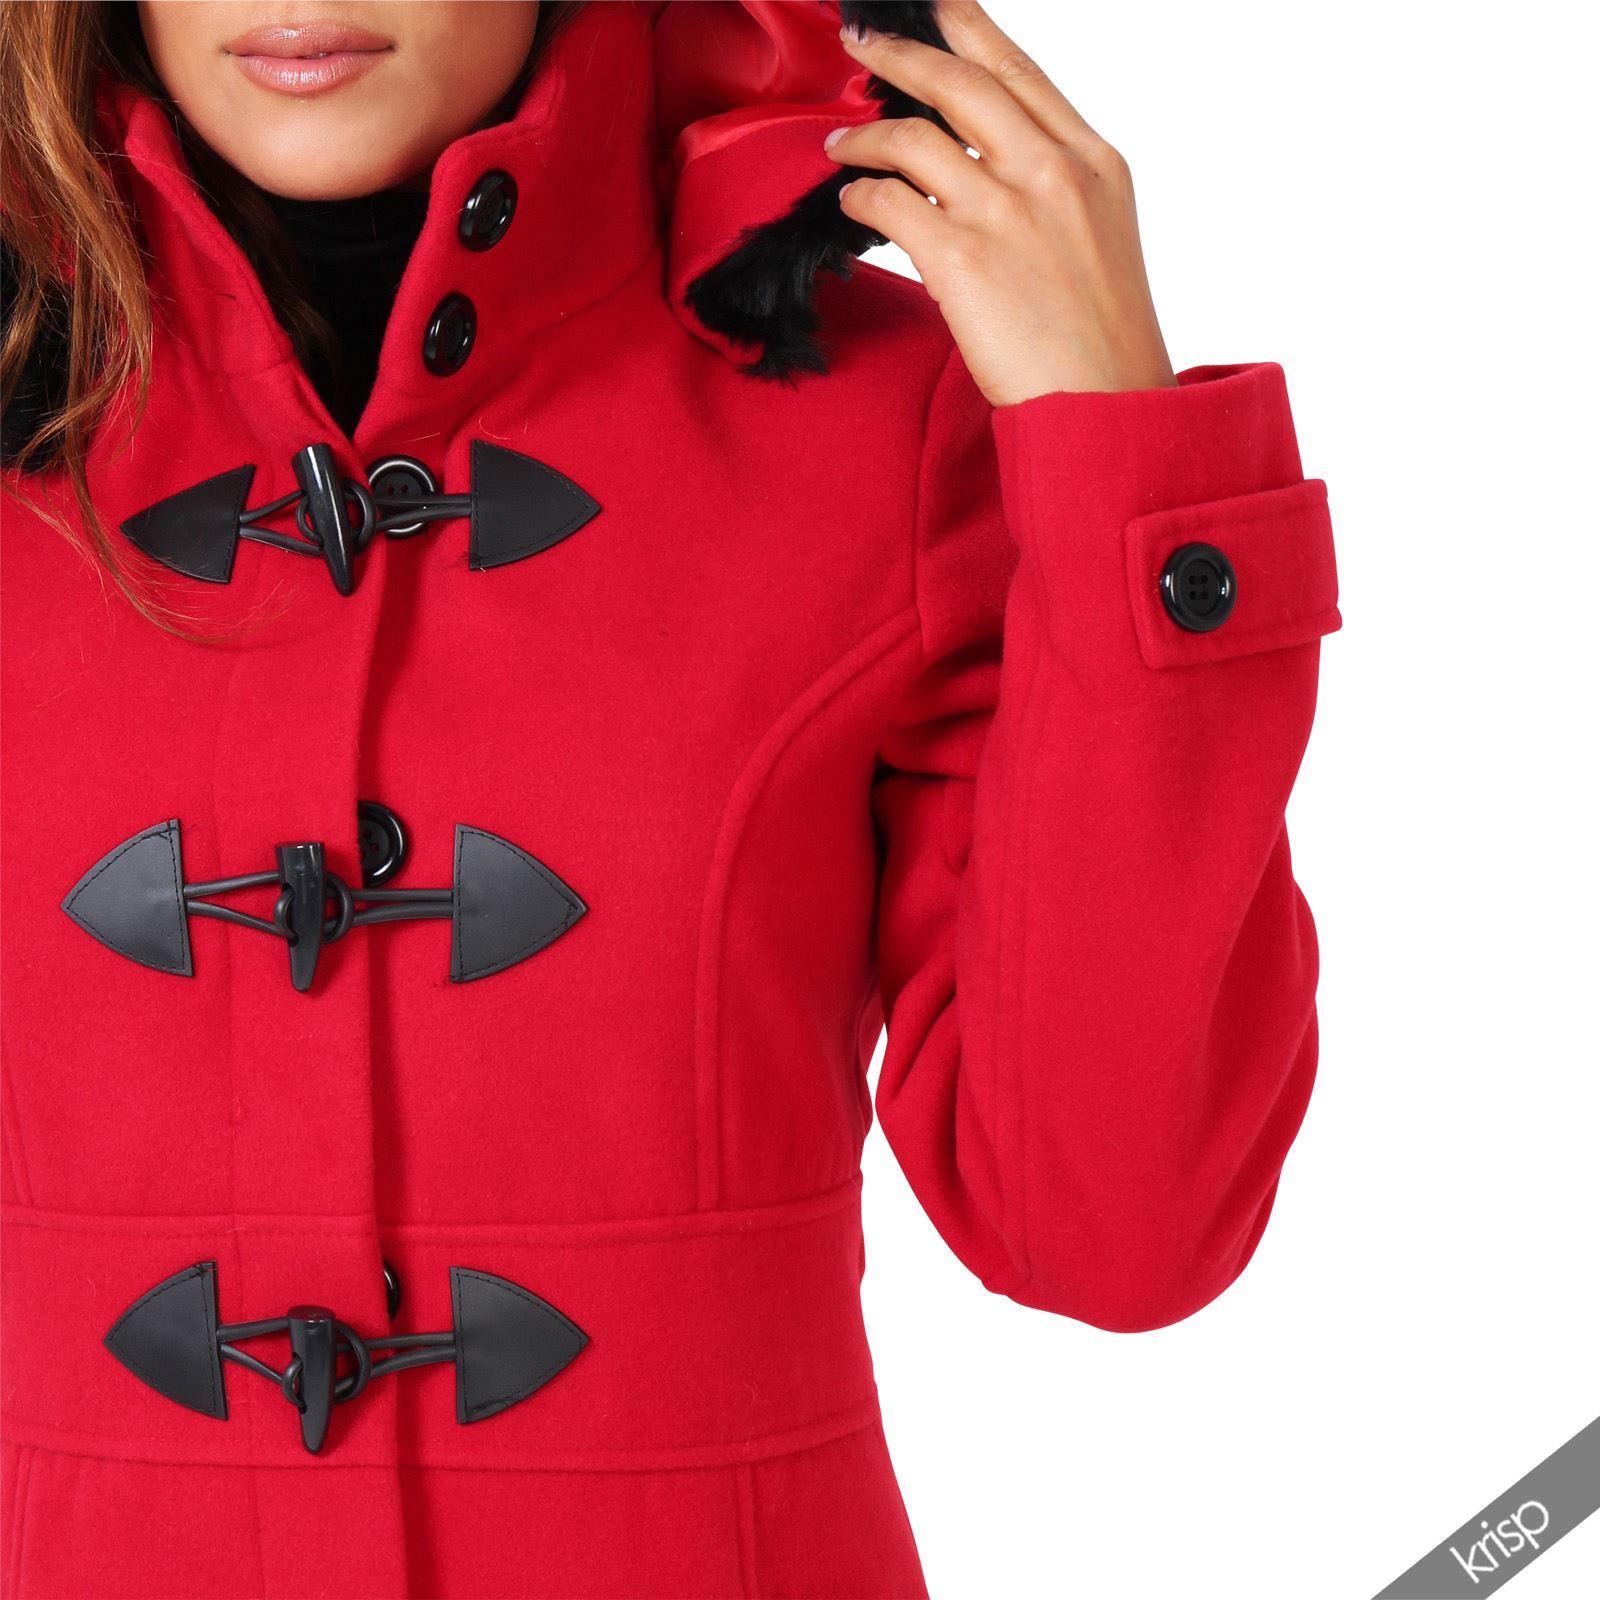 Manteau duffle coat femme en solde